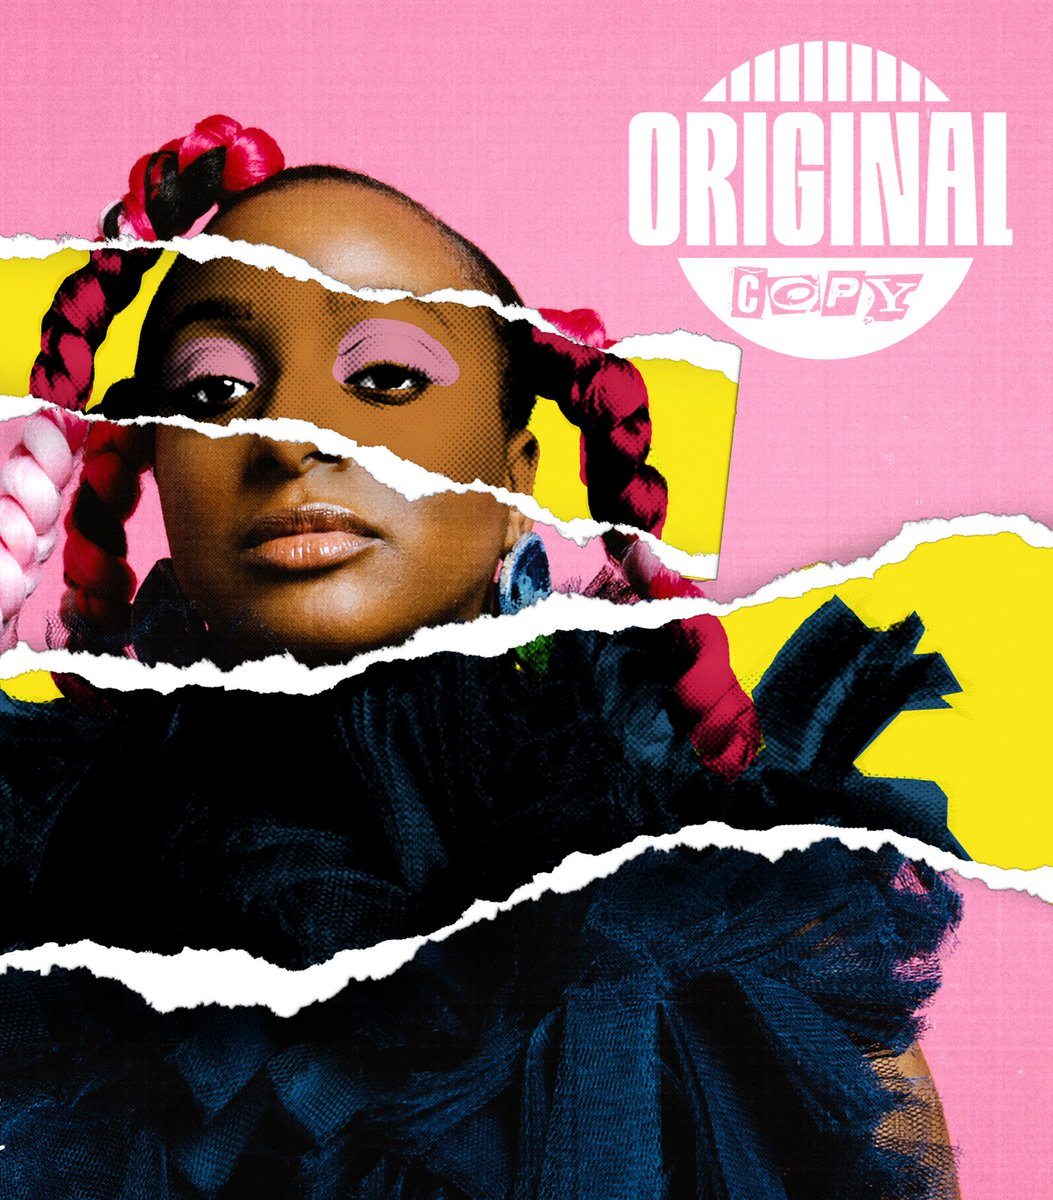 Listen to my Debut Album #OriginalCopy 🧁🎶 LINK: platoon.lnk.to/originalcopy